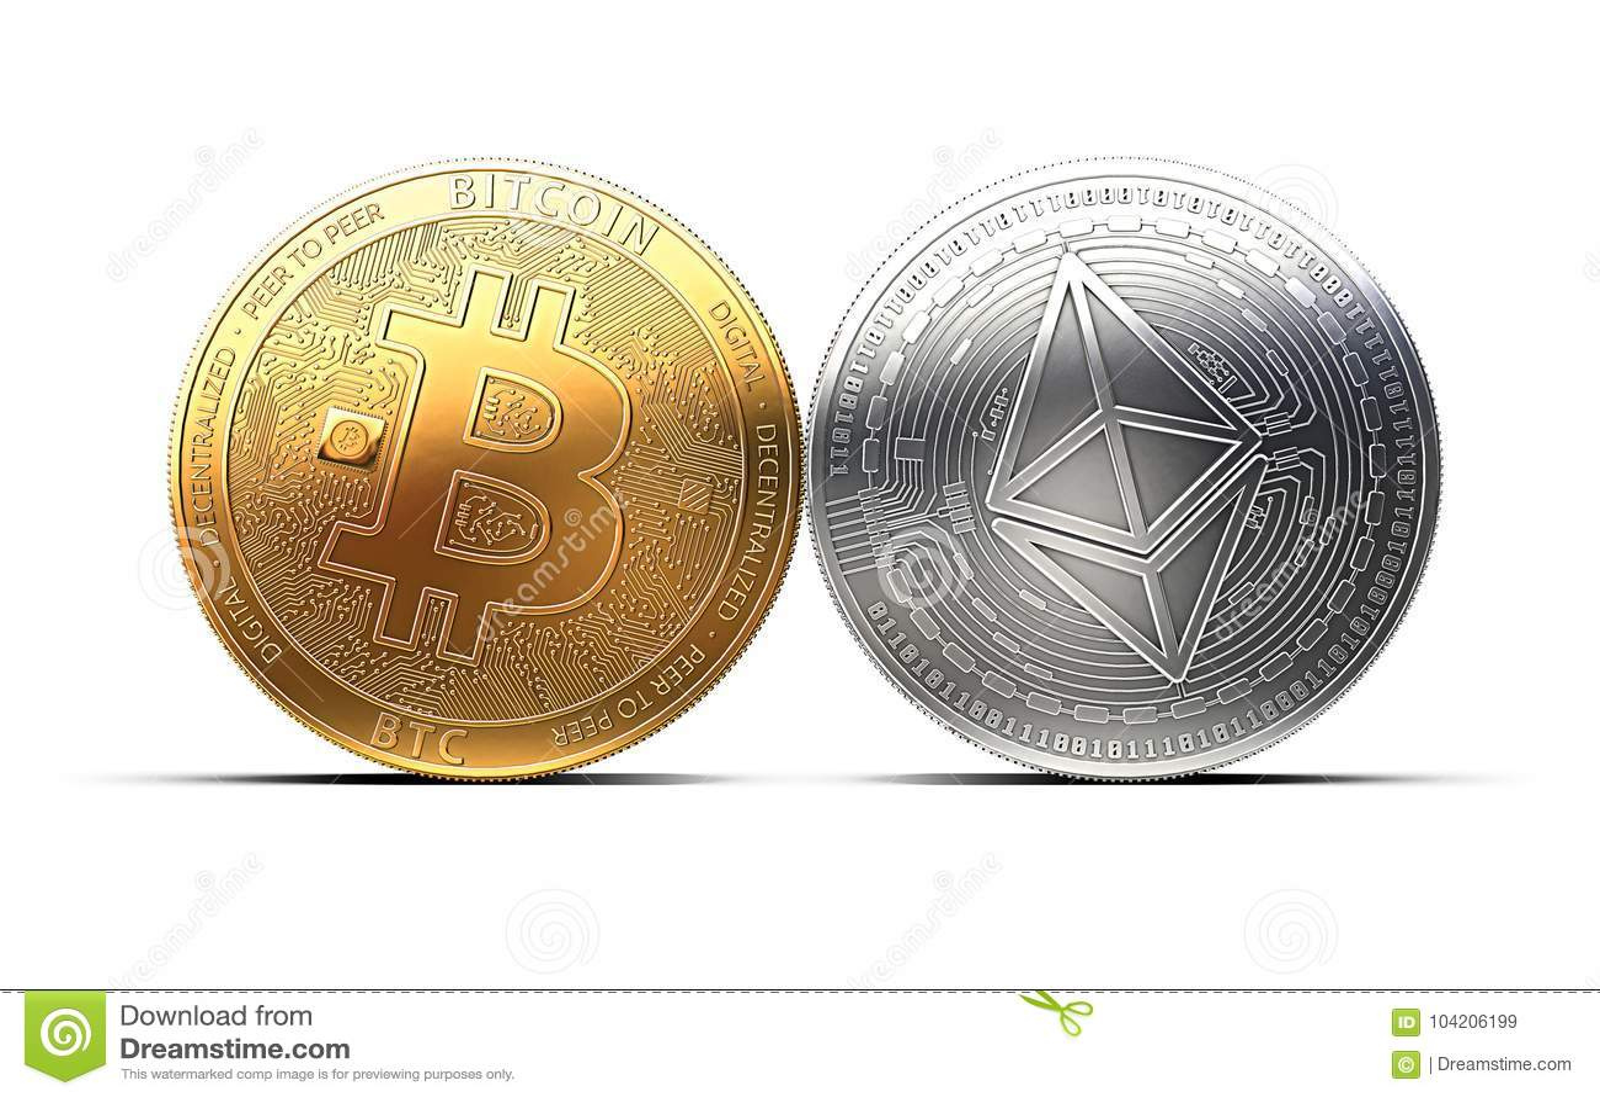 commerciale tra bitcoin e ethereum